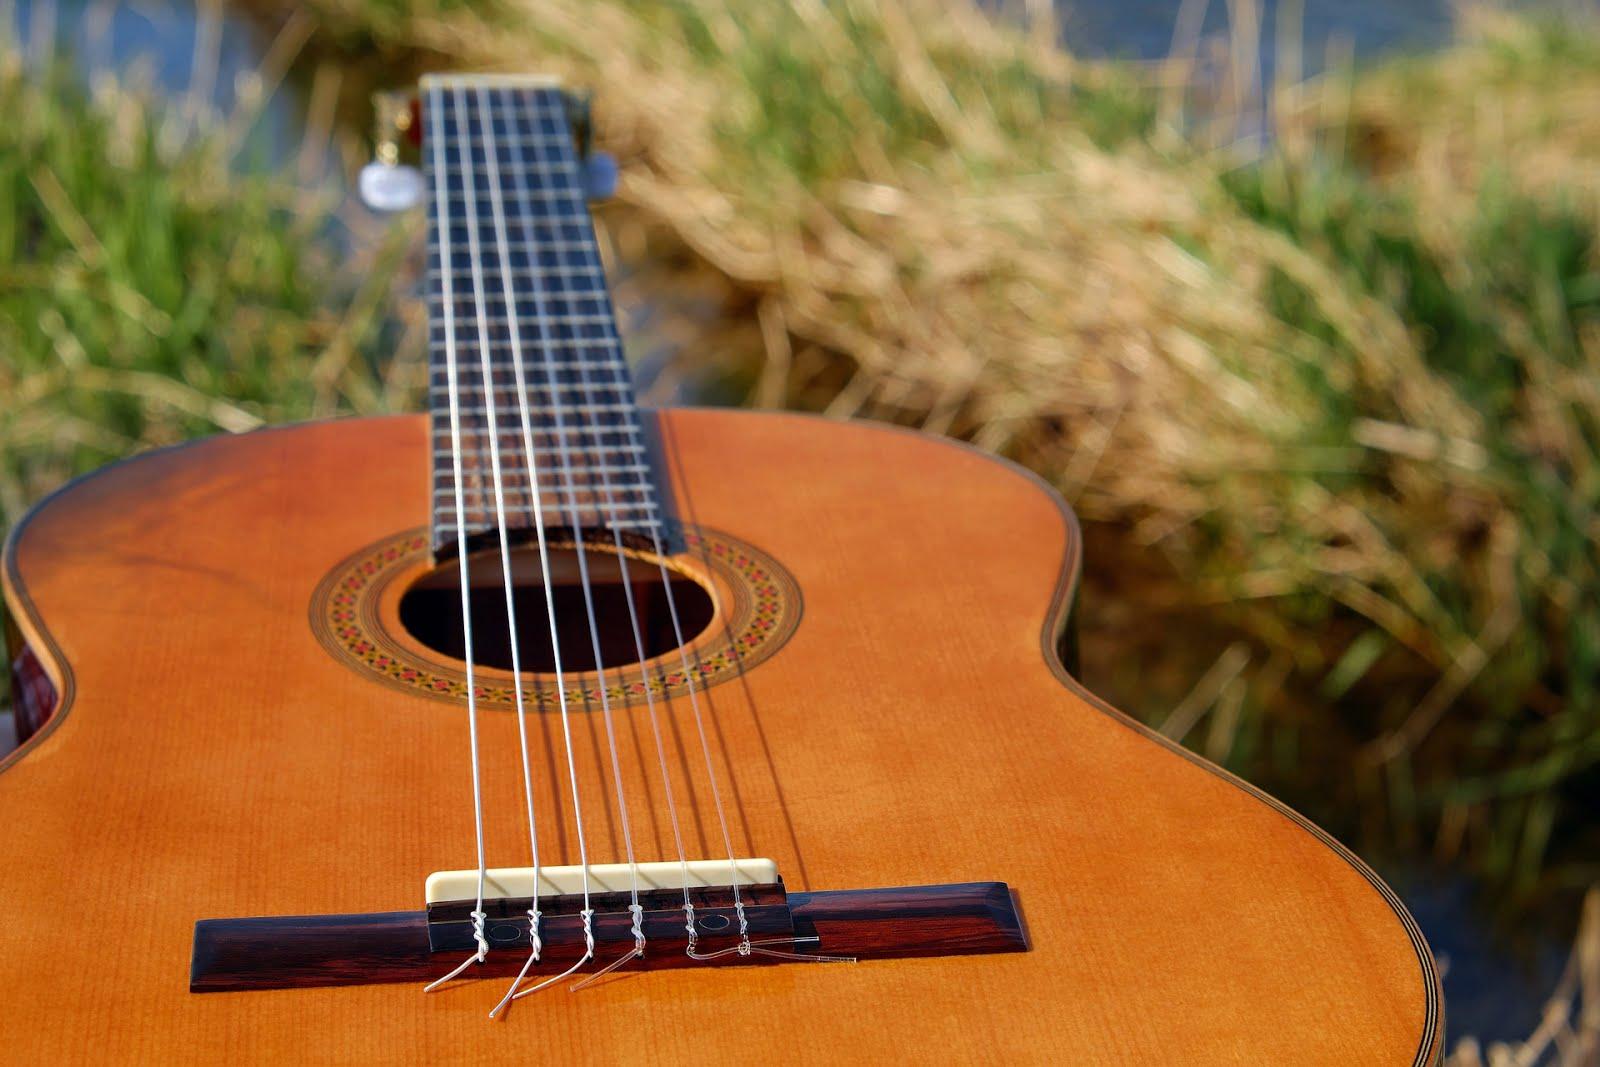 gitar, slashky gitaris, www.slashkygitaris.com, belajar gitar, tips bermain gitar, menciptakan lagu, tips membuat lagu,